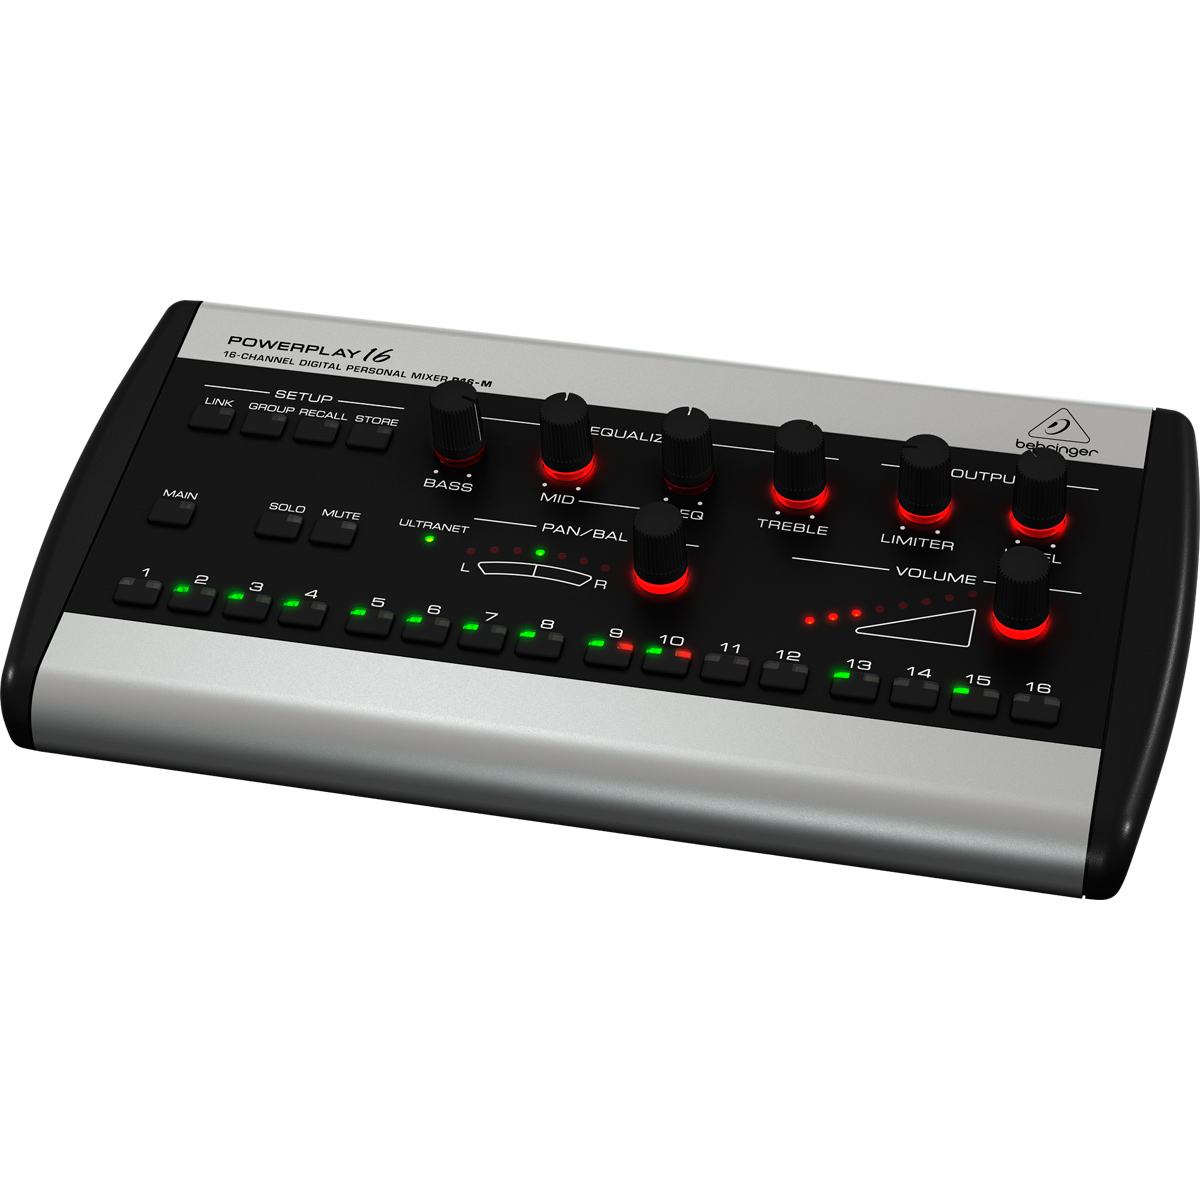 Monitor Digital 16 Canais p/ Fone In Ear Powerplay P16 M - Behringer